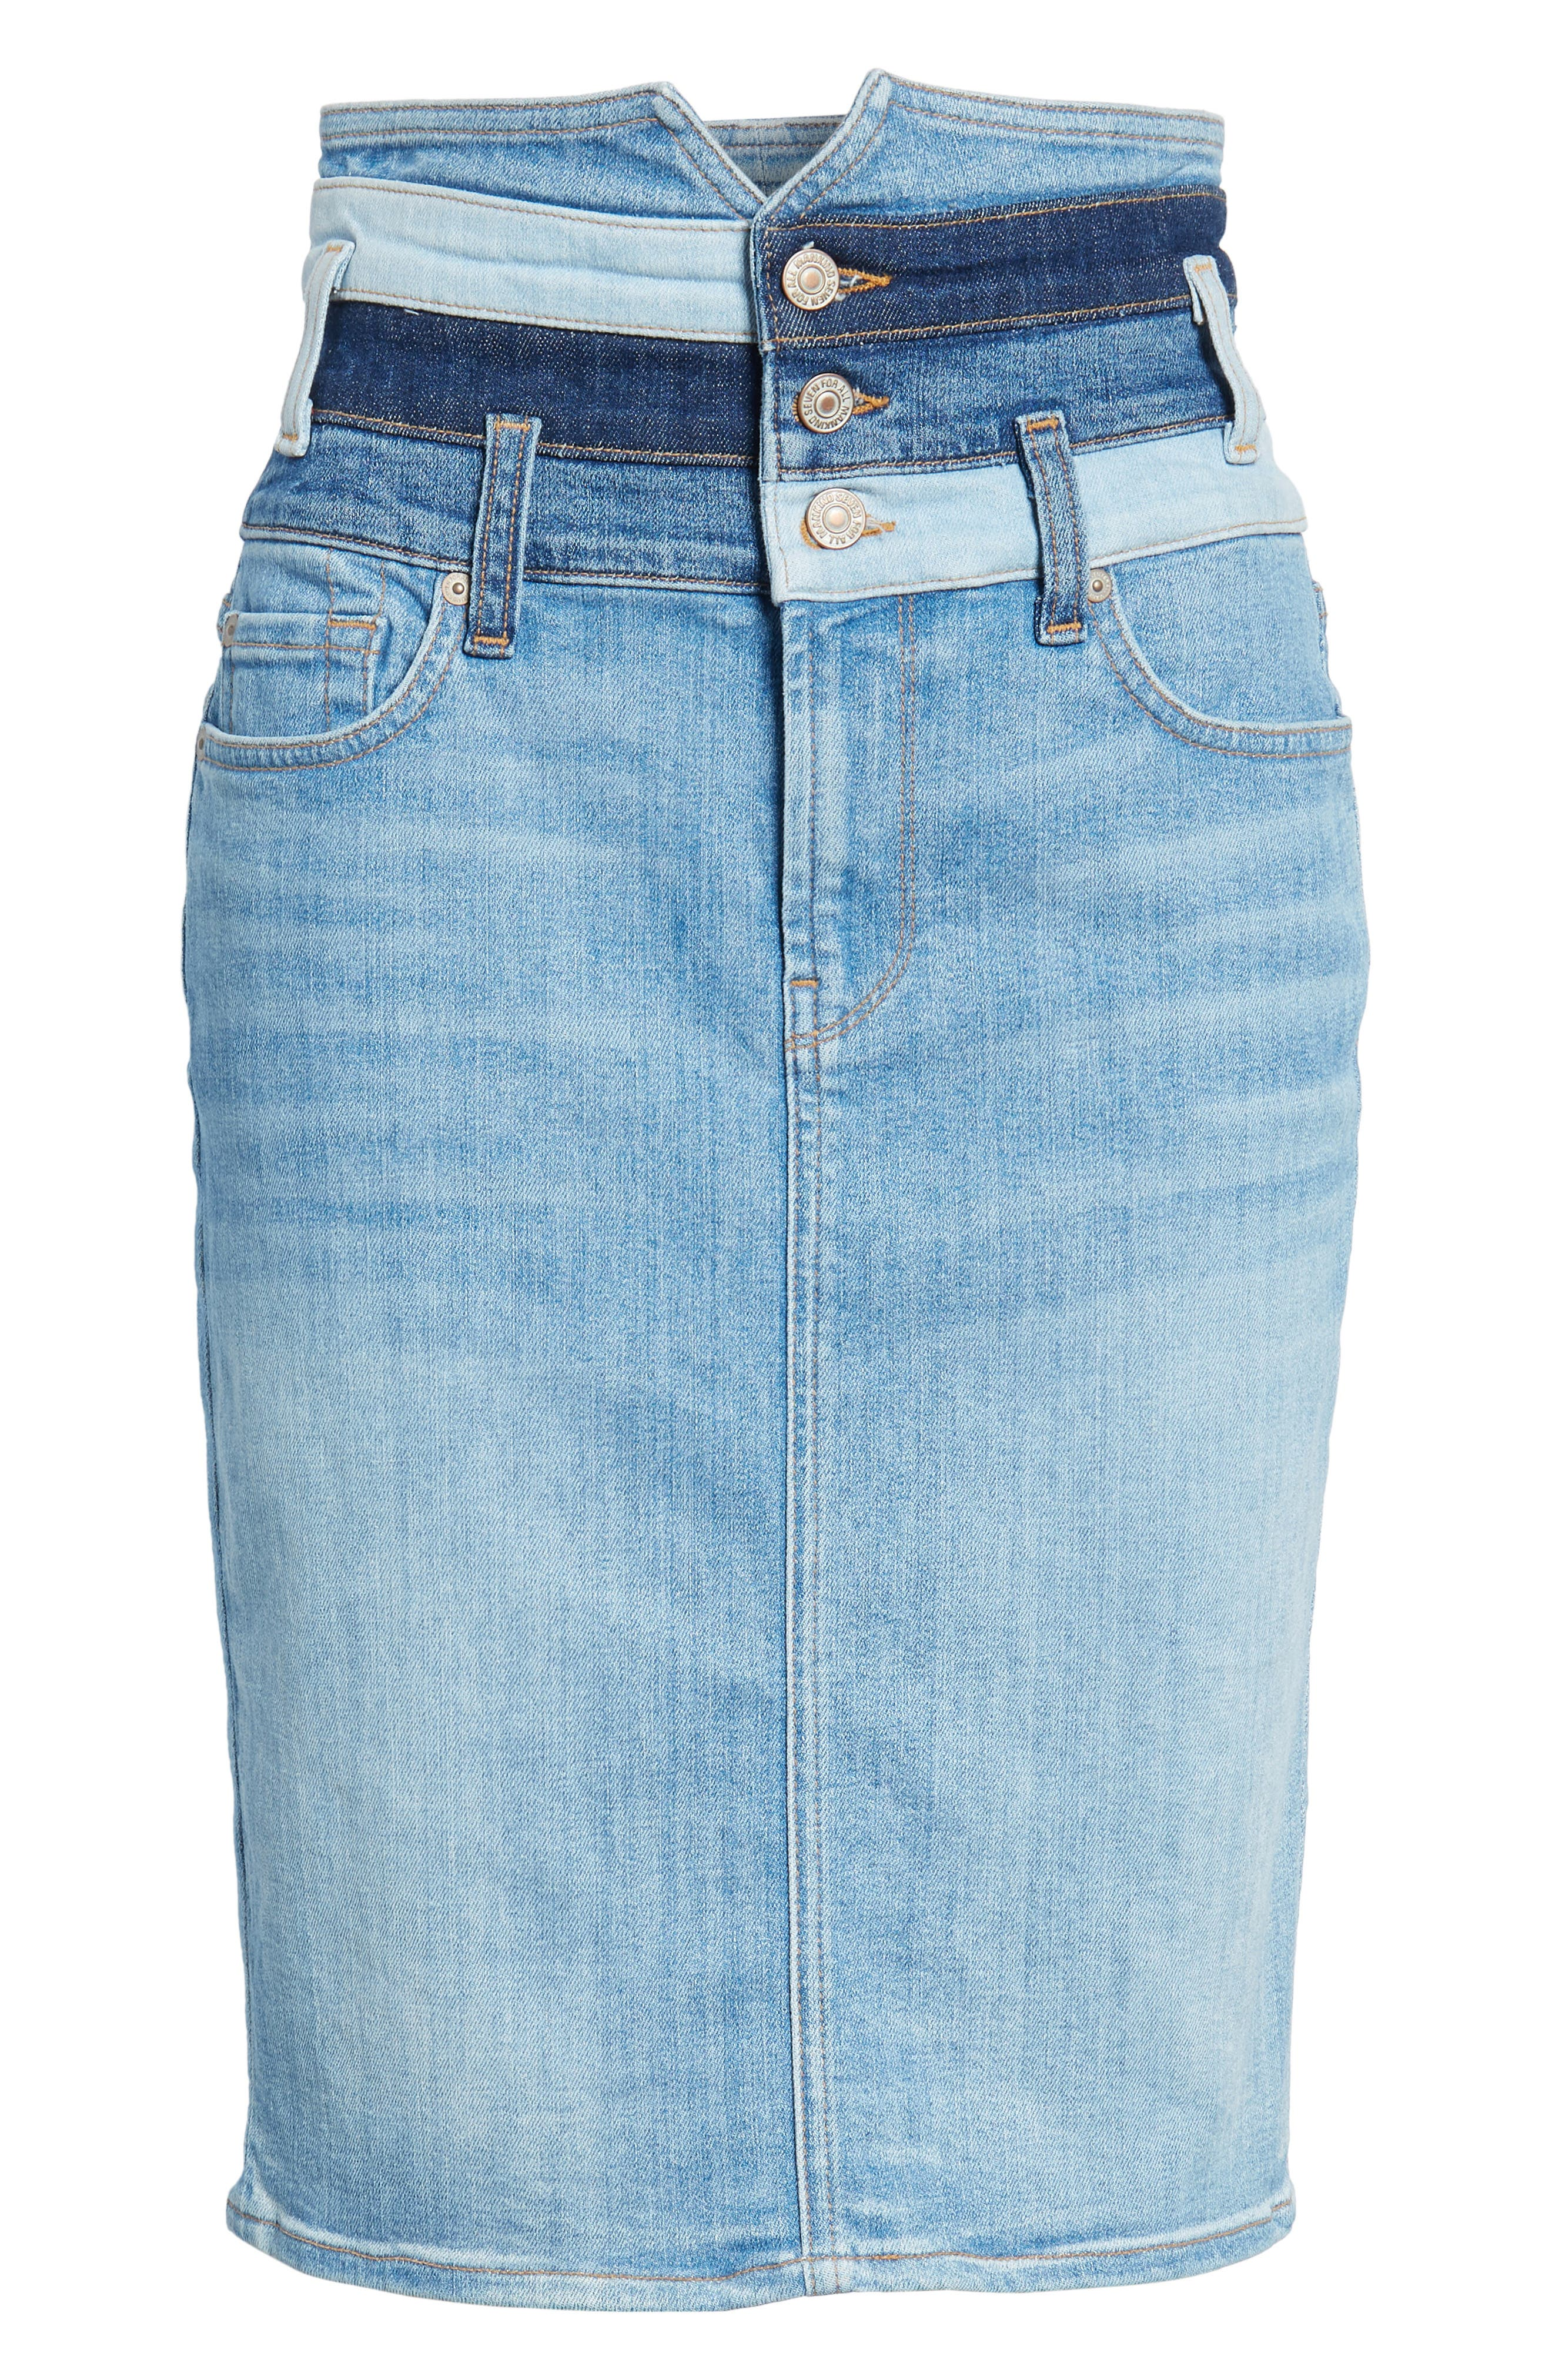 Patchwork Denim Skirt,                             Alternate thumbnail 6, color,                             Patchwork Found 5